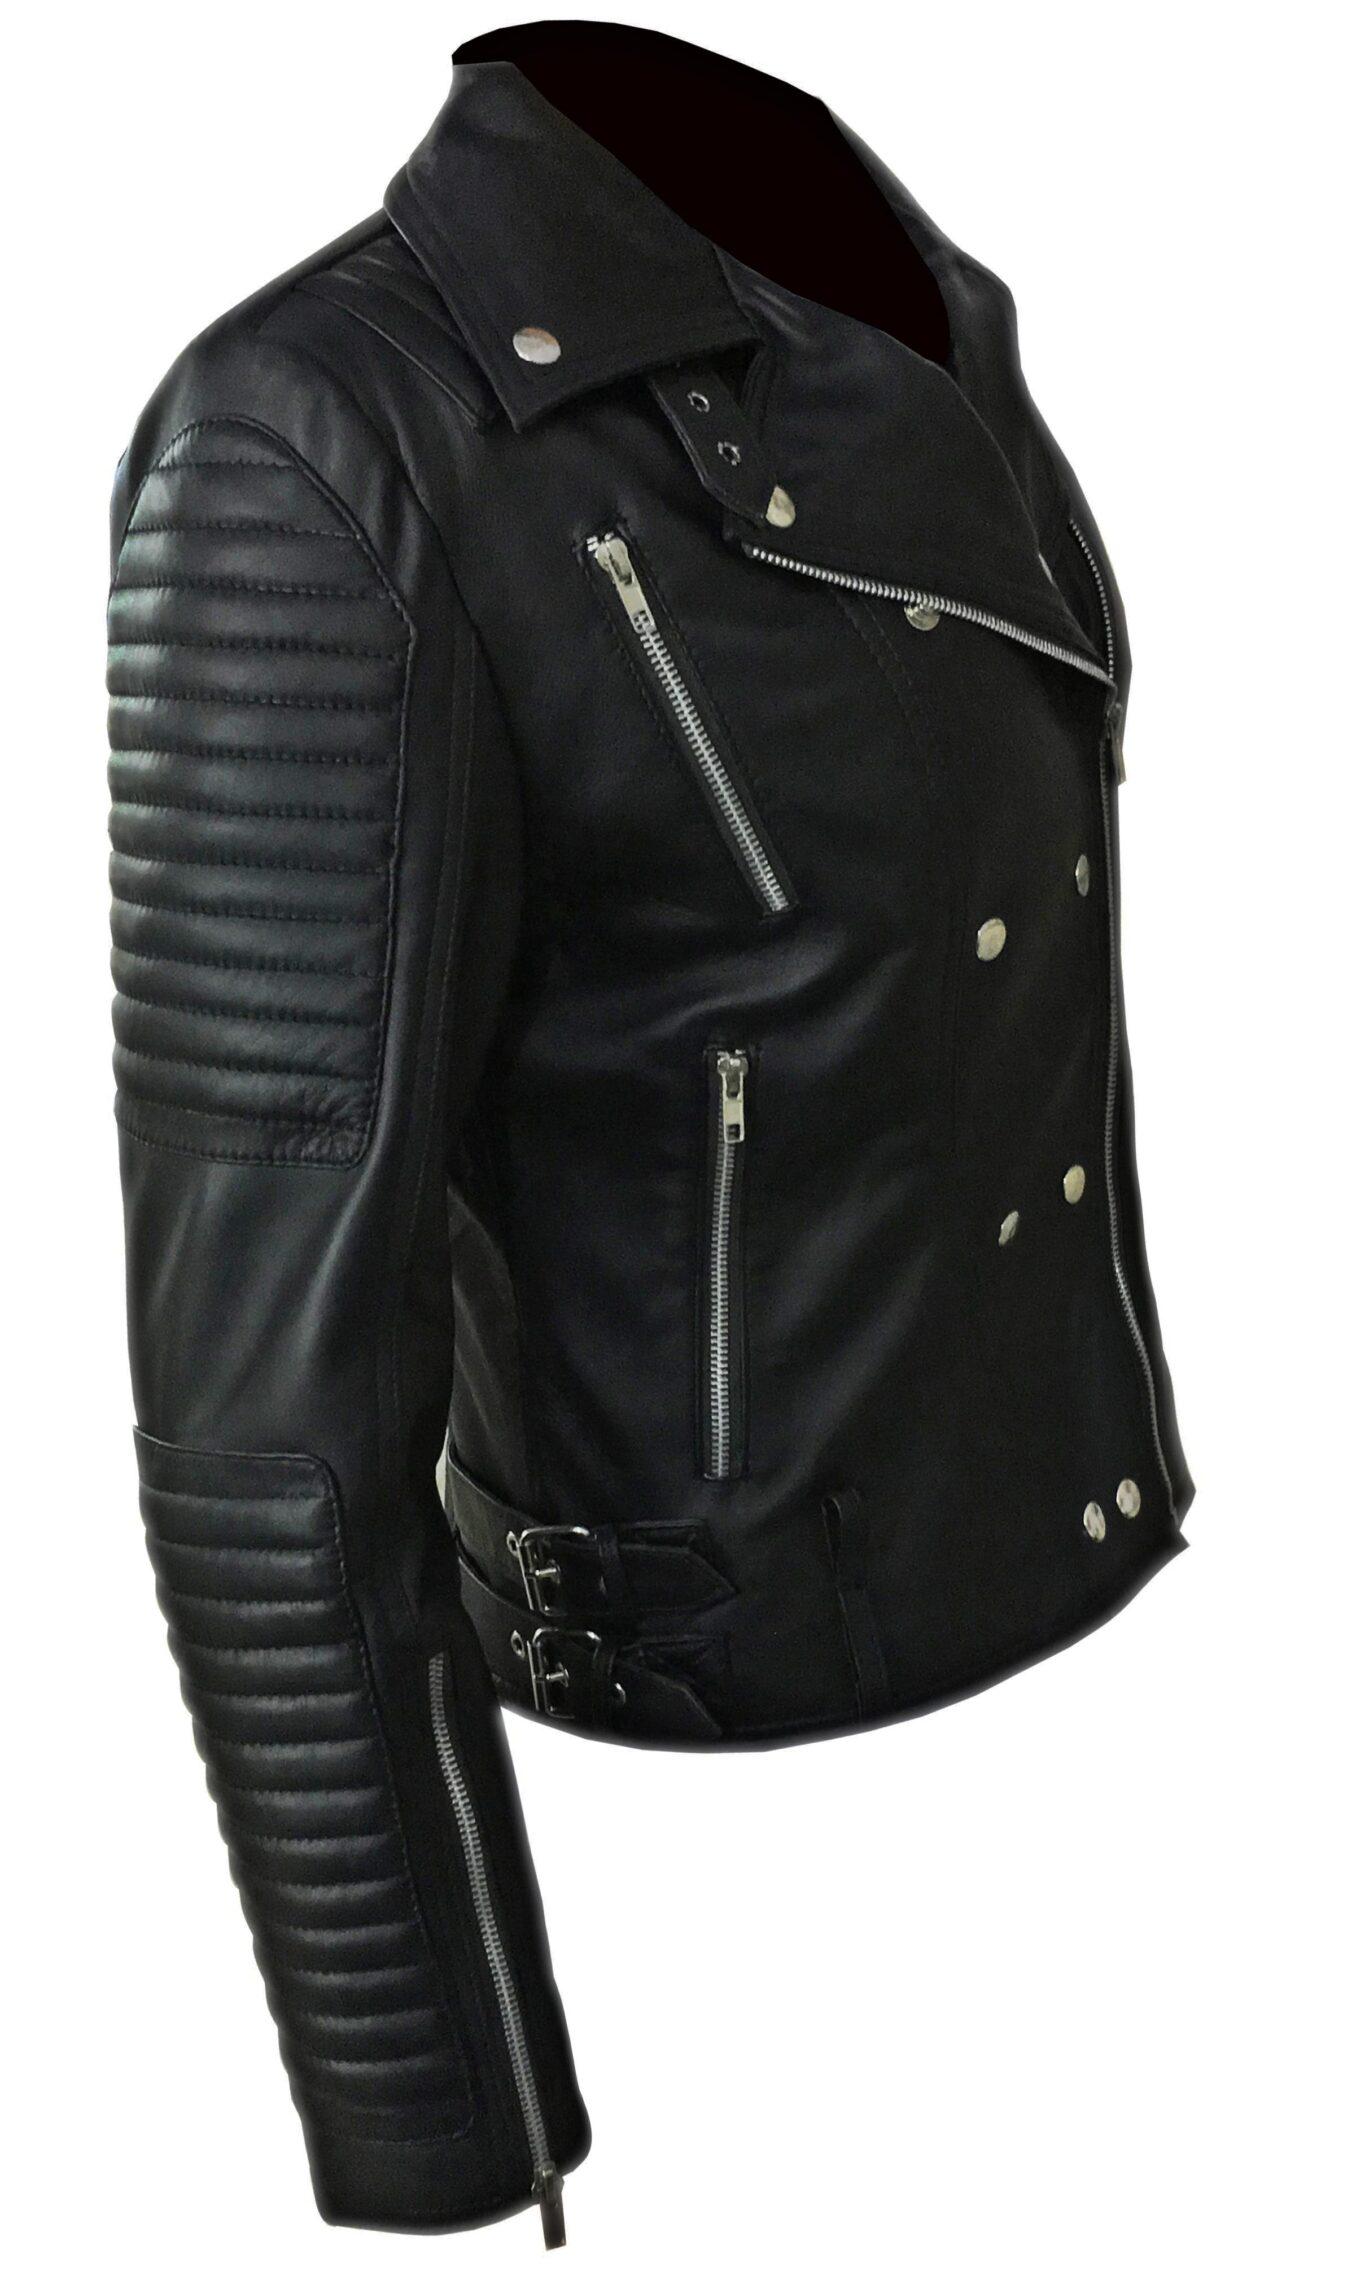 Kiki Black Leather Jacket